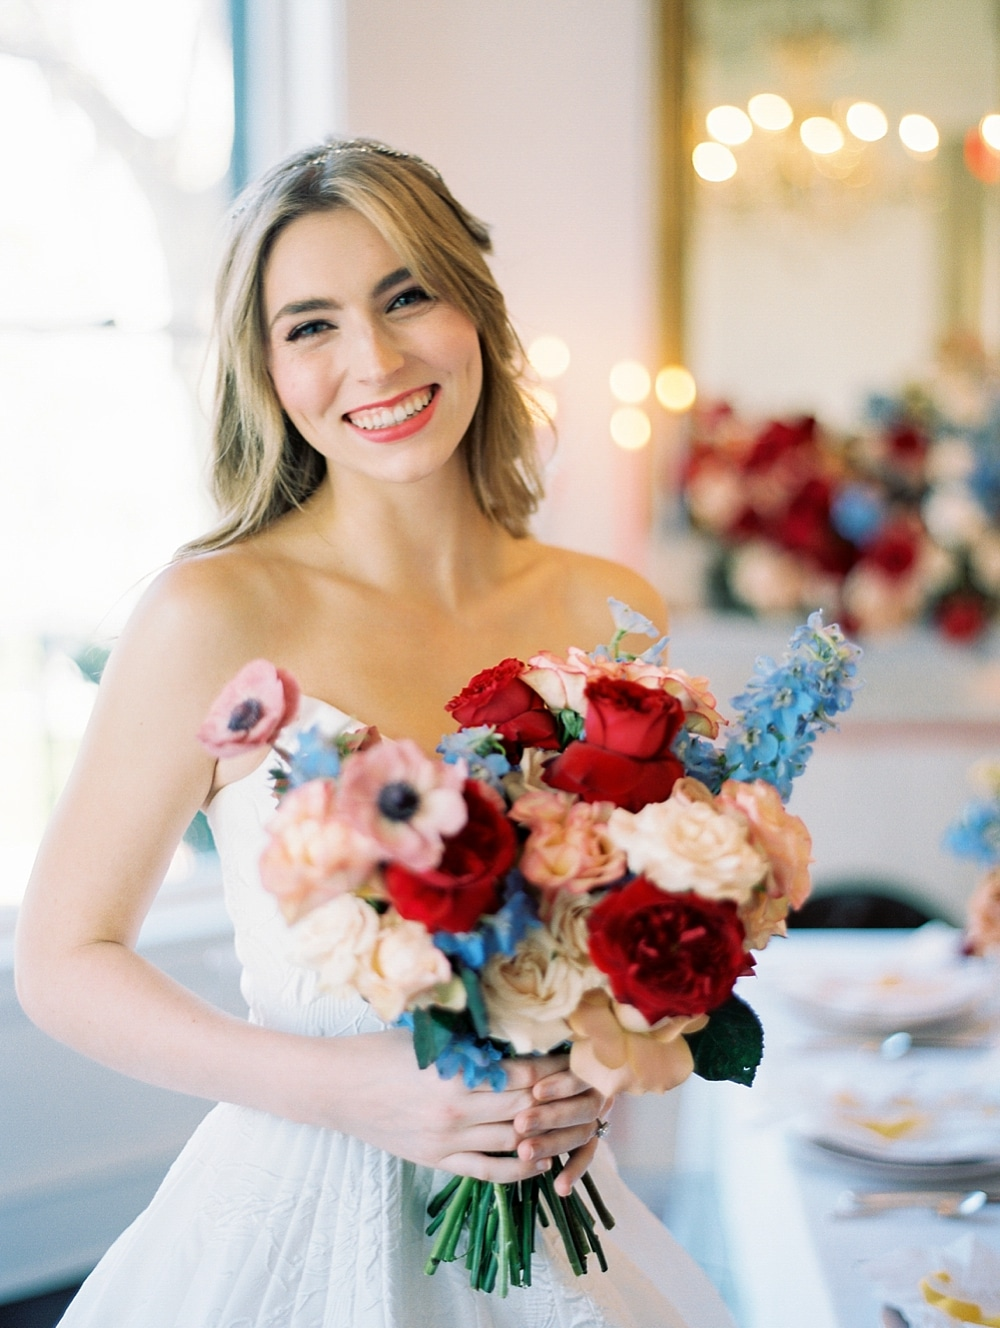 kristin-la-voie-photography-austin-wedding-photographer-woodbine-mansion-125